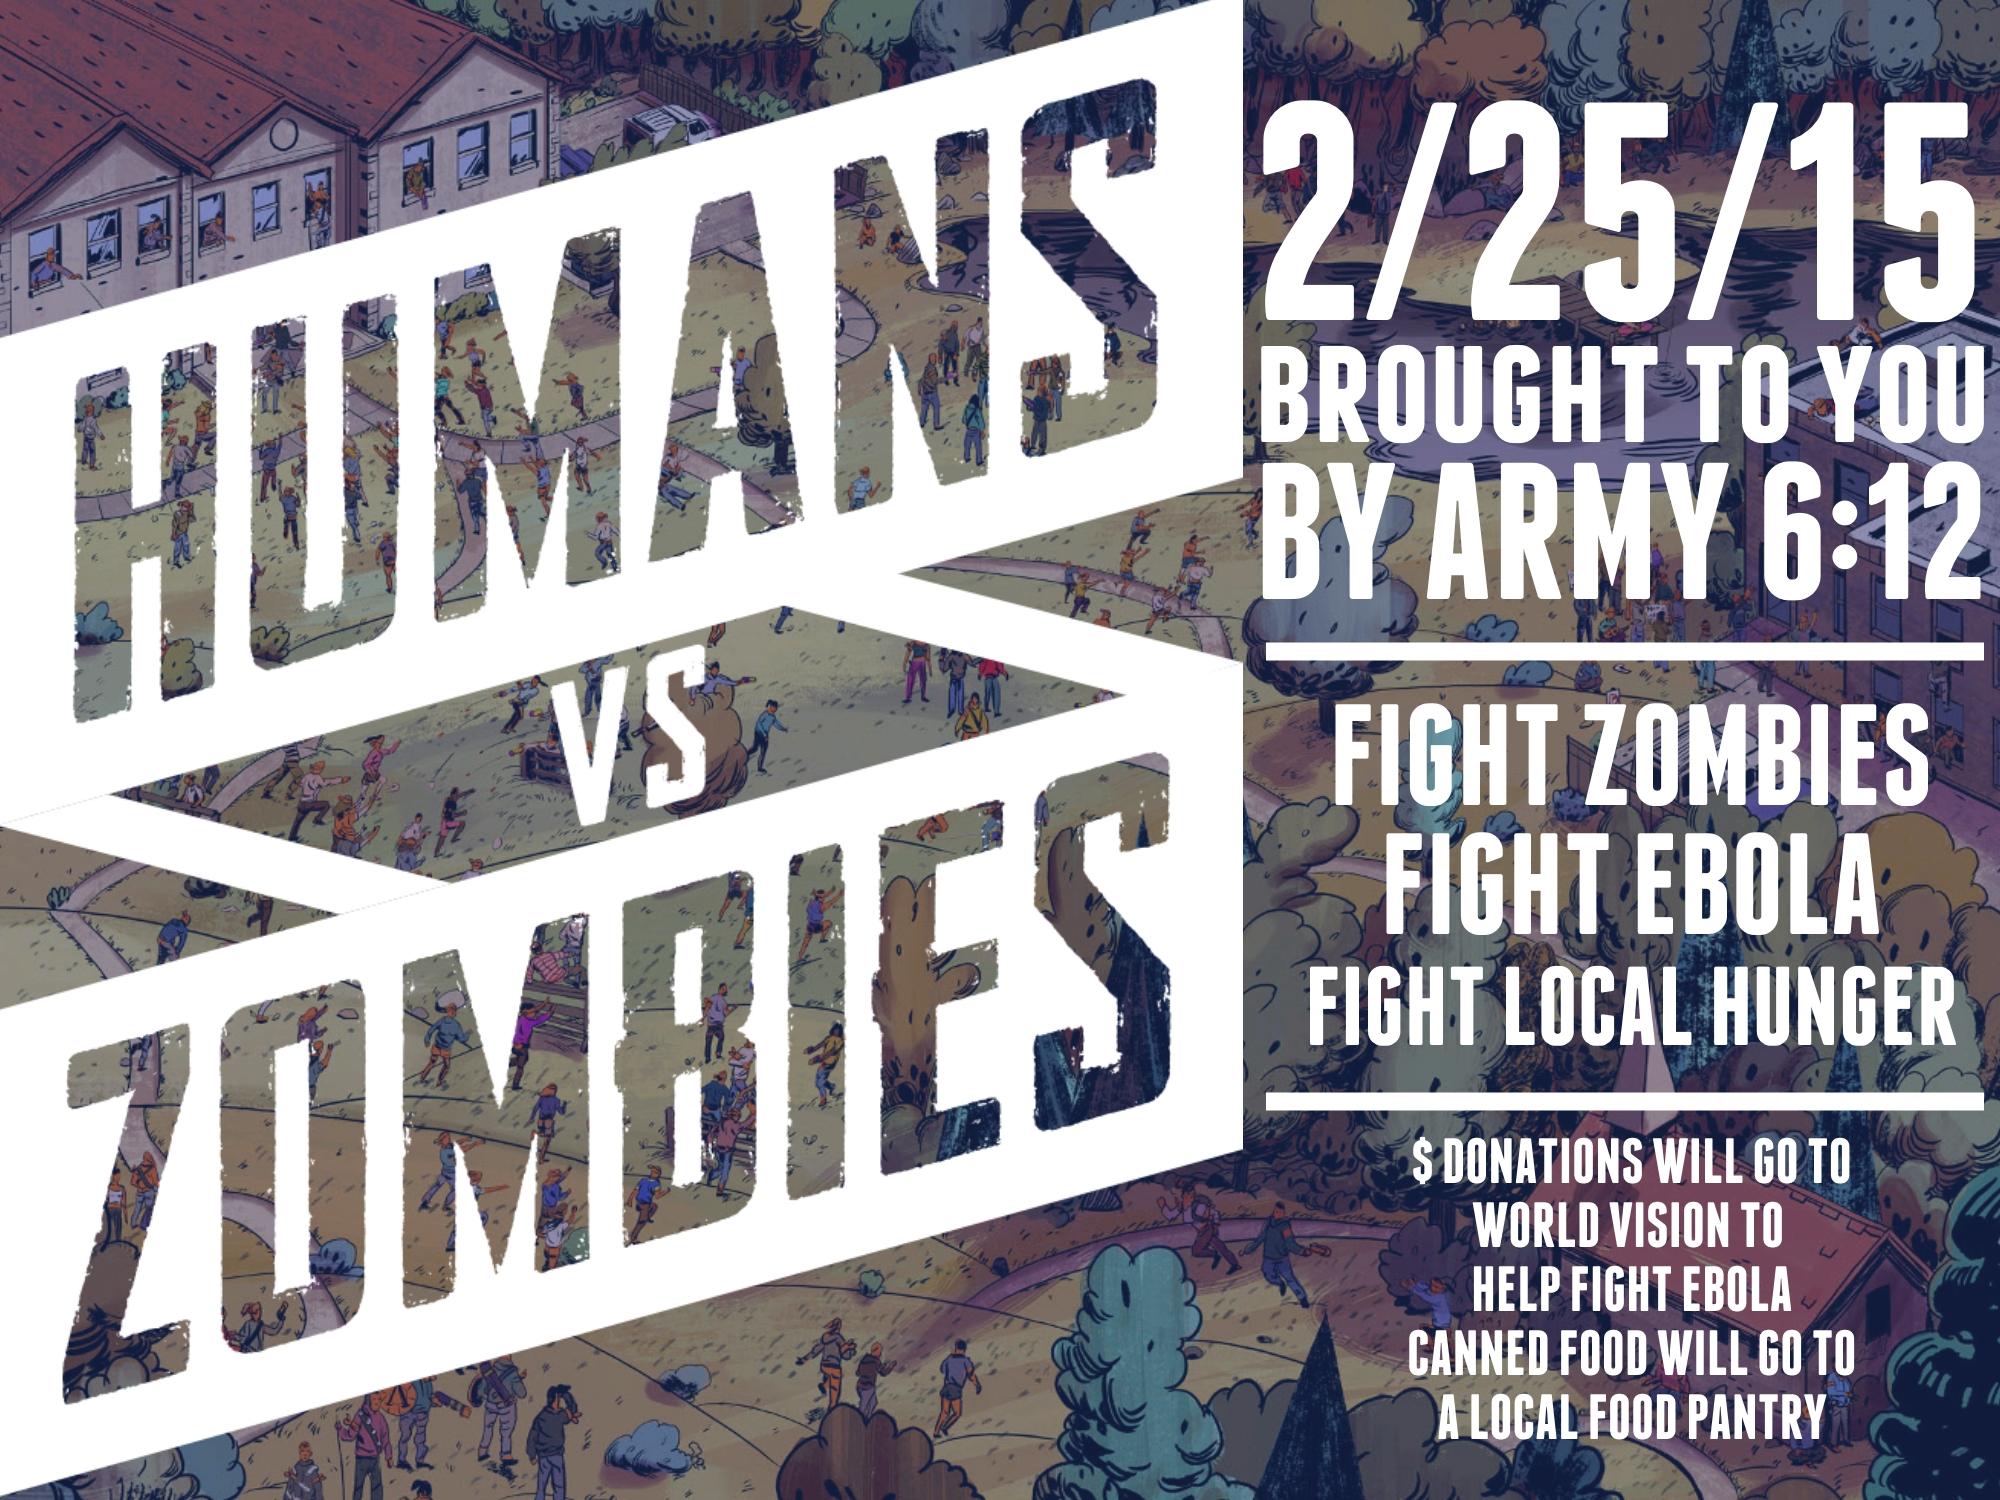 HUmans vs zombies.jpg